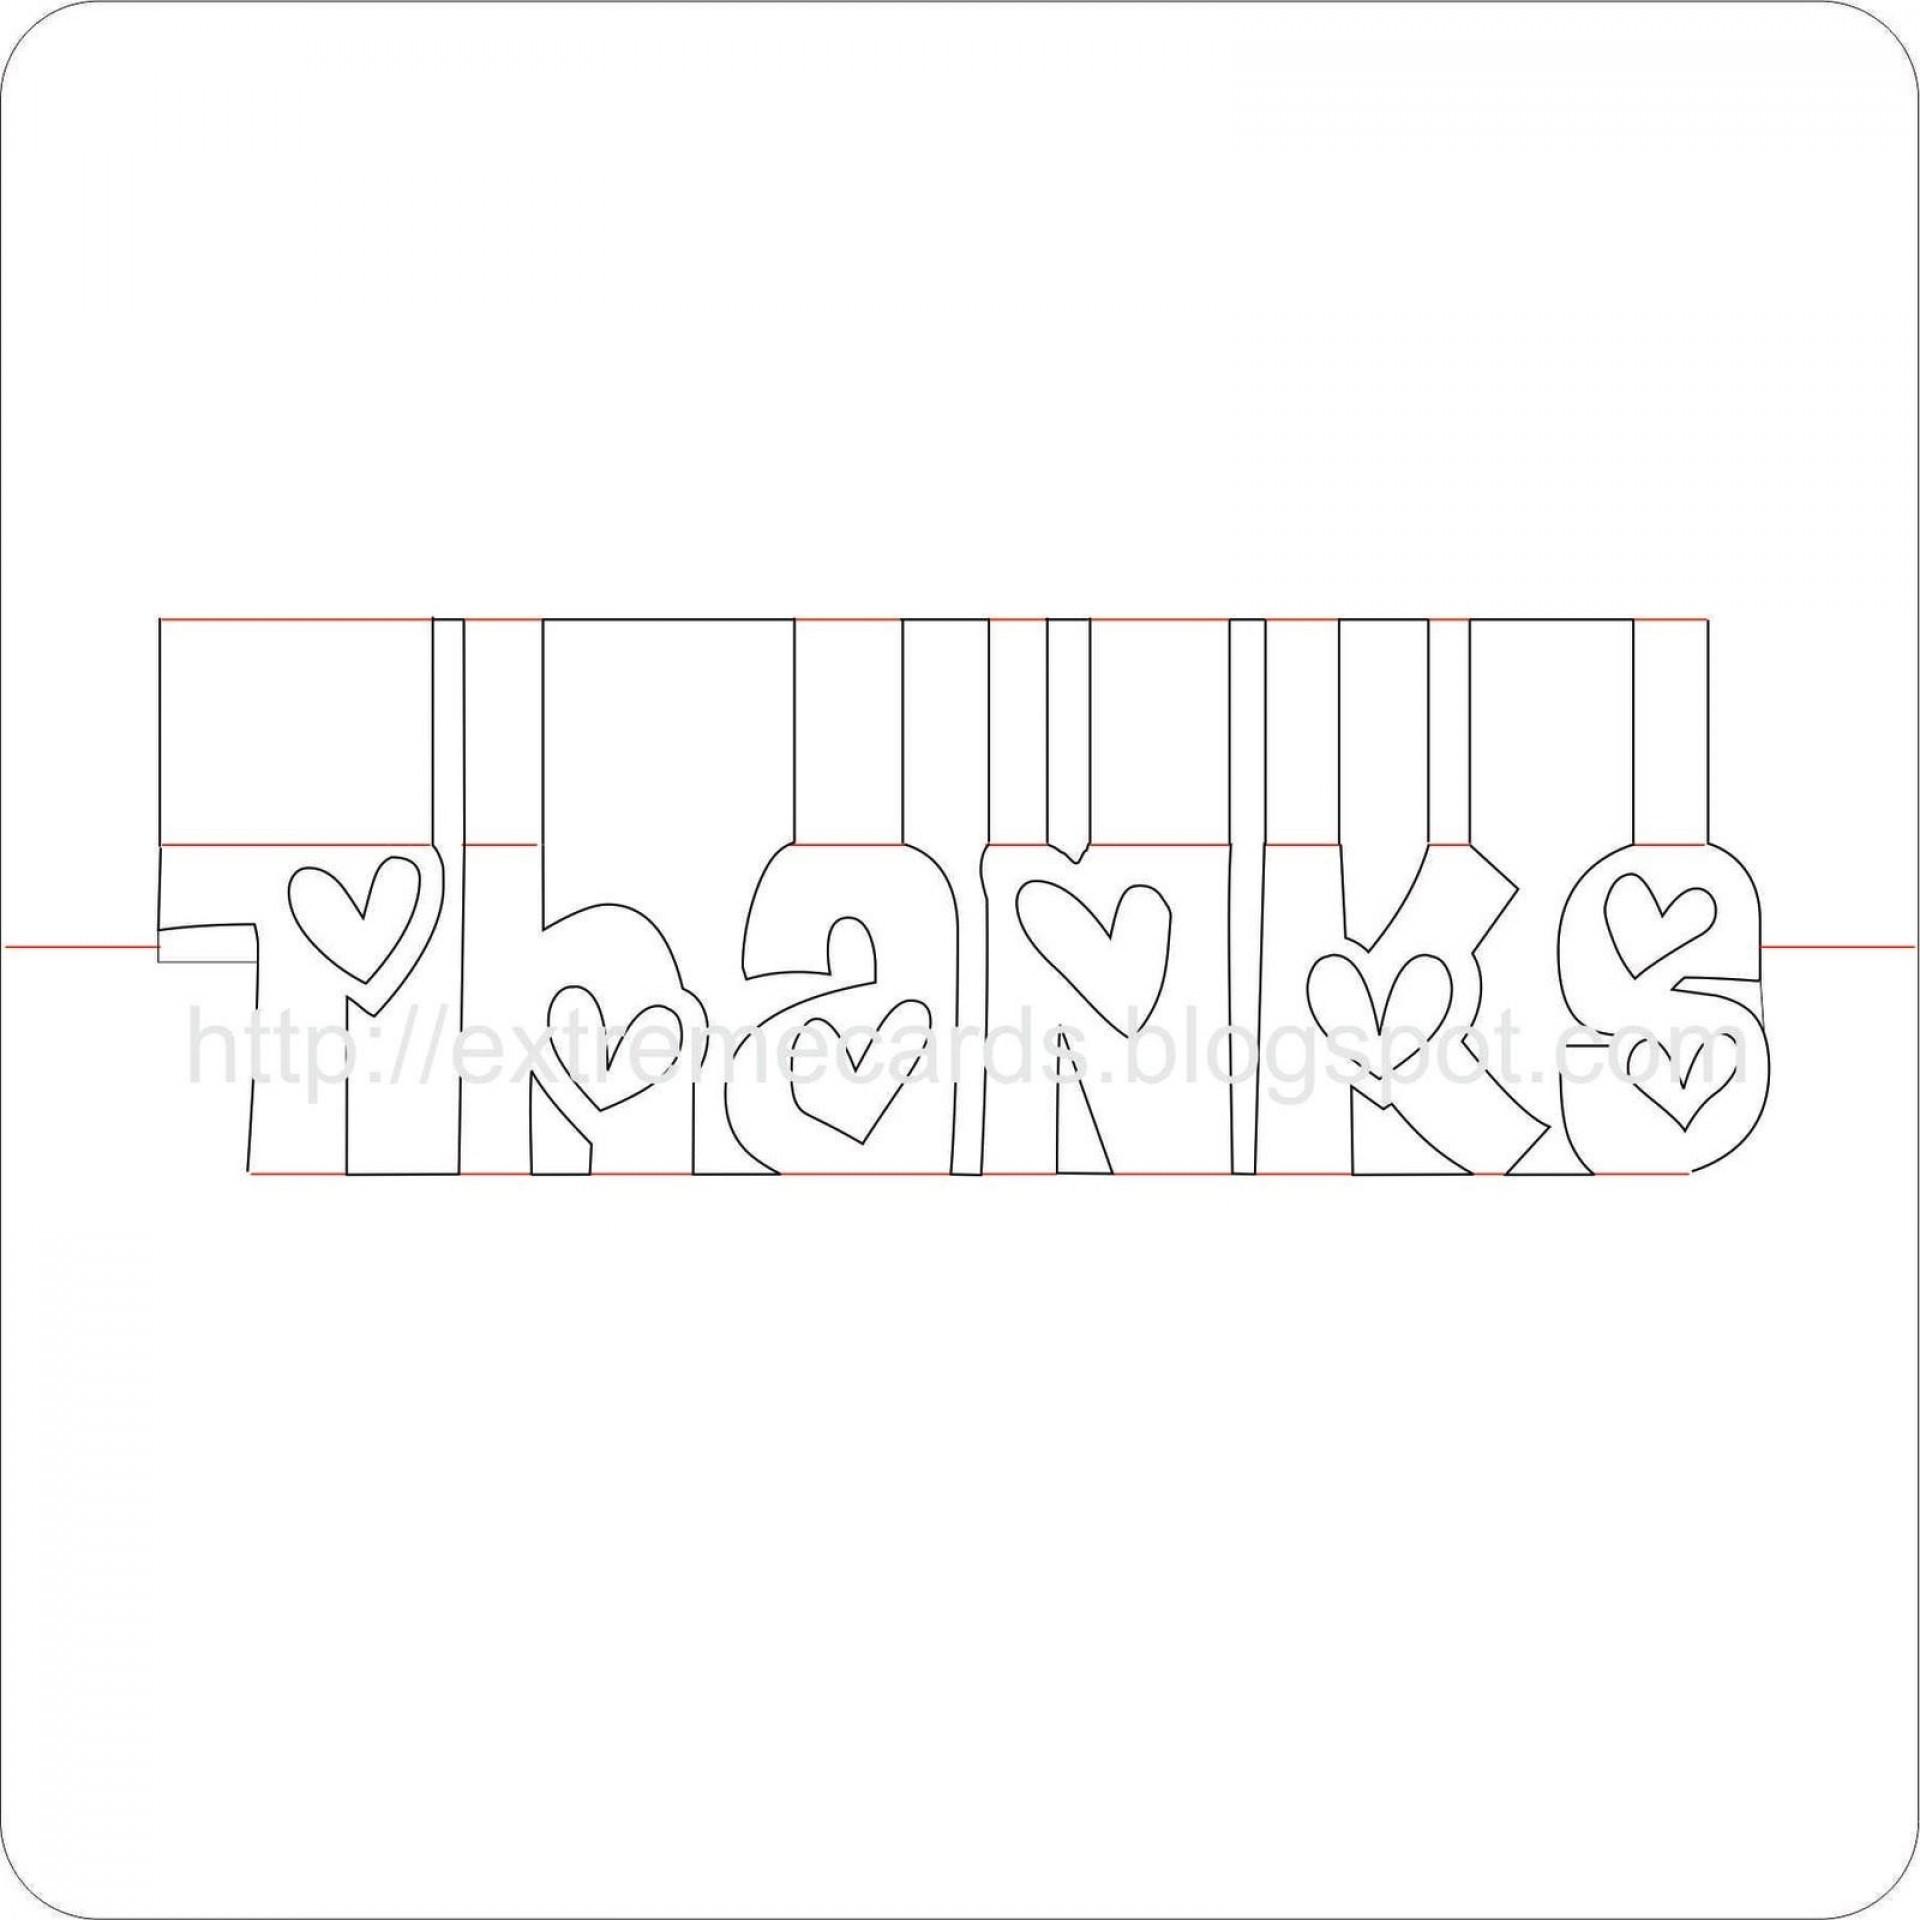 003 Best Pop Up Card Template Concept  3d Pdf Carousel Pattern Download1920